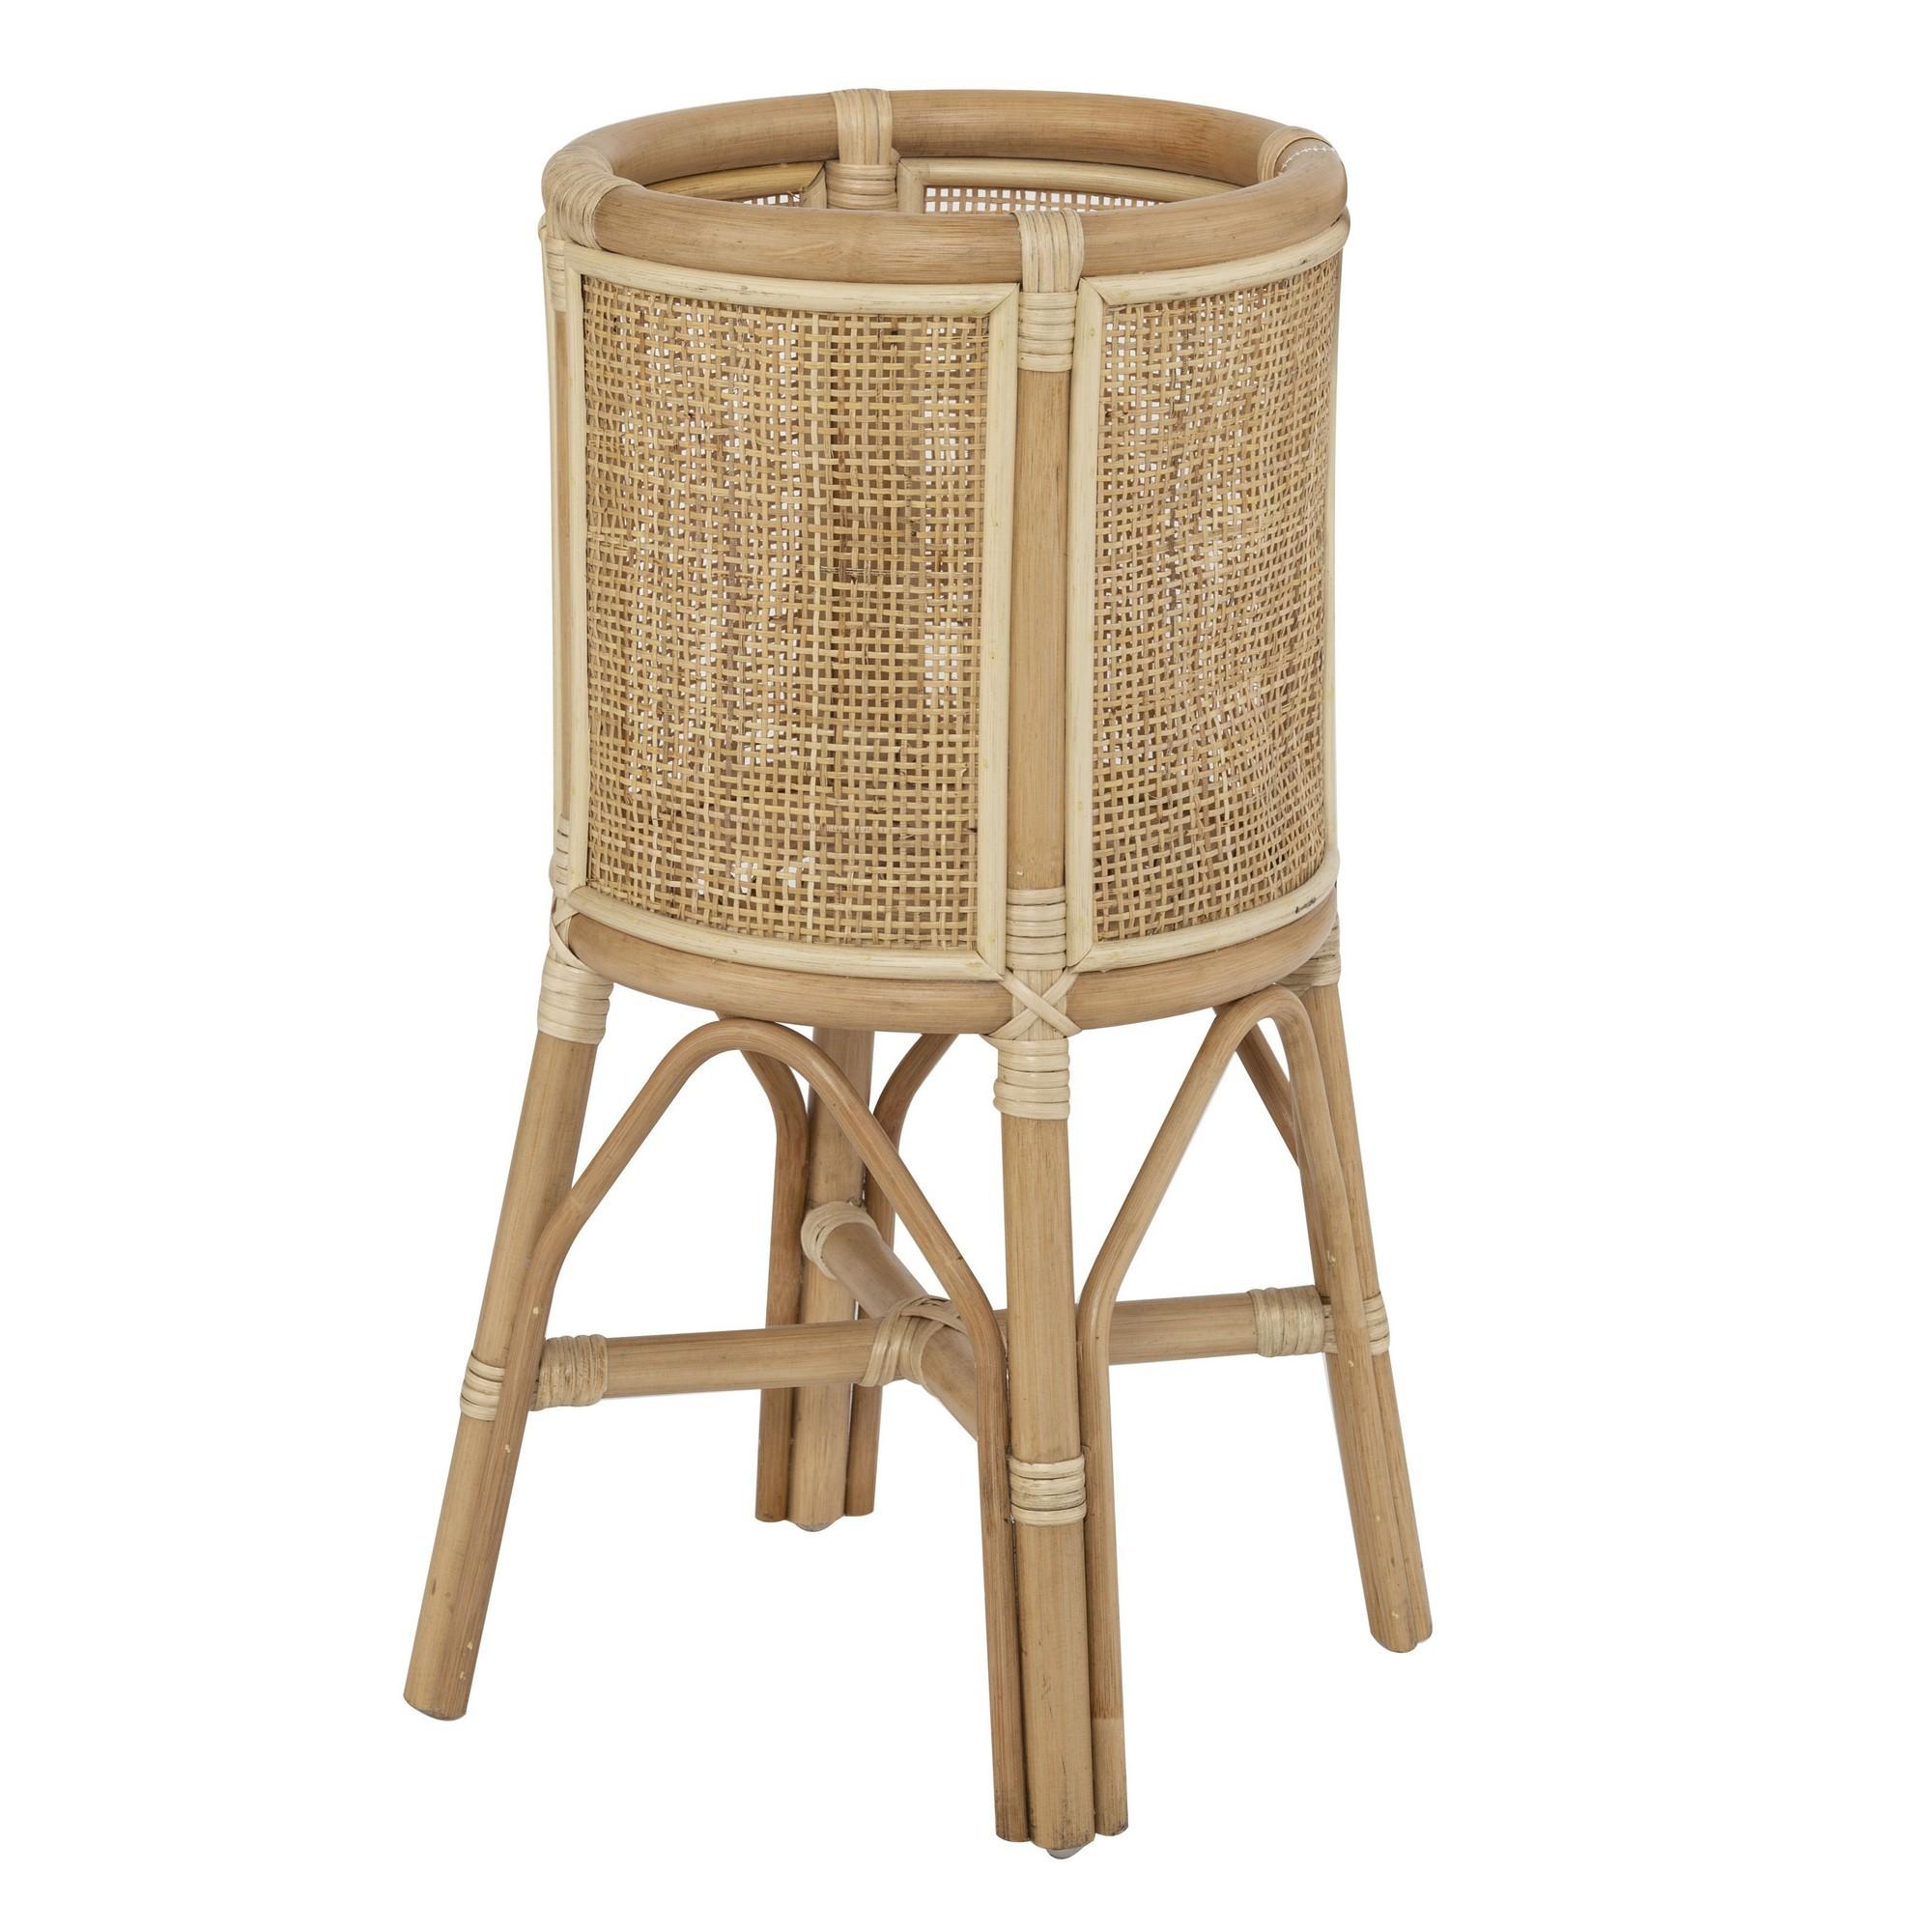 Bekasi Bamboo Rattan Planter Stand